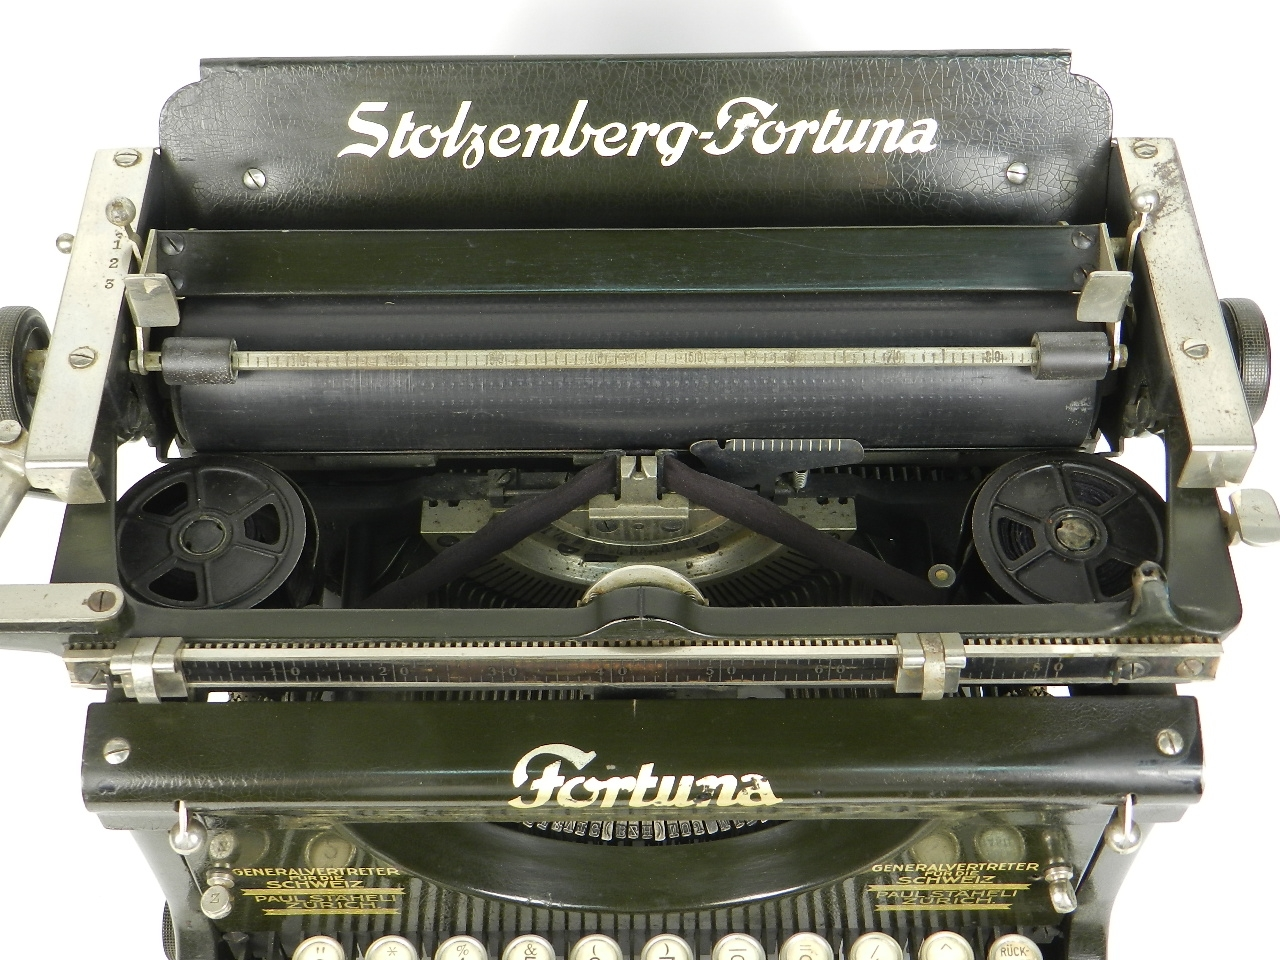 Imagen STOLZENBERG-FORTUNA AÑO 1922 COLOR VERDE 29266